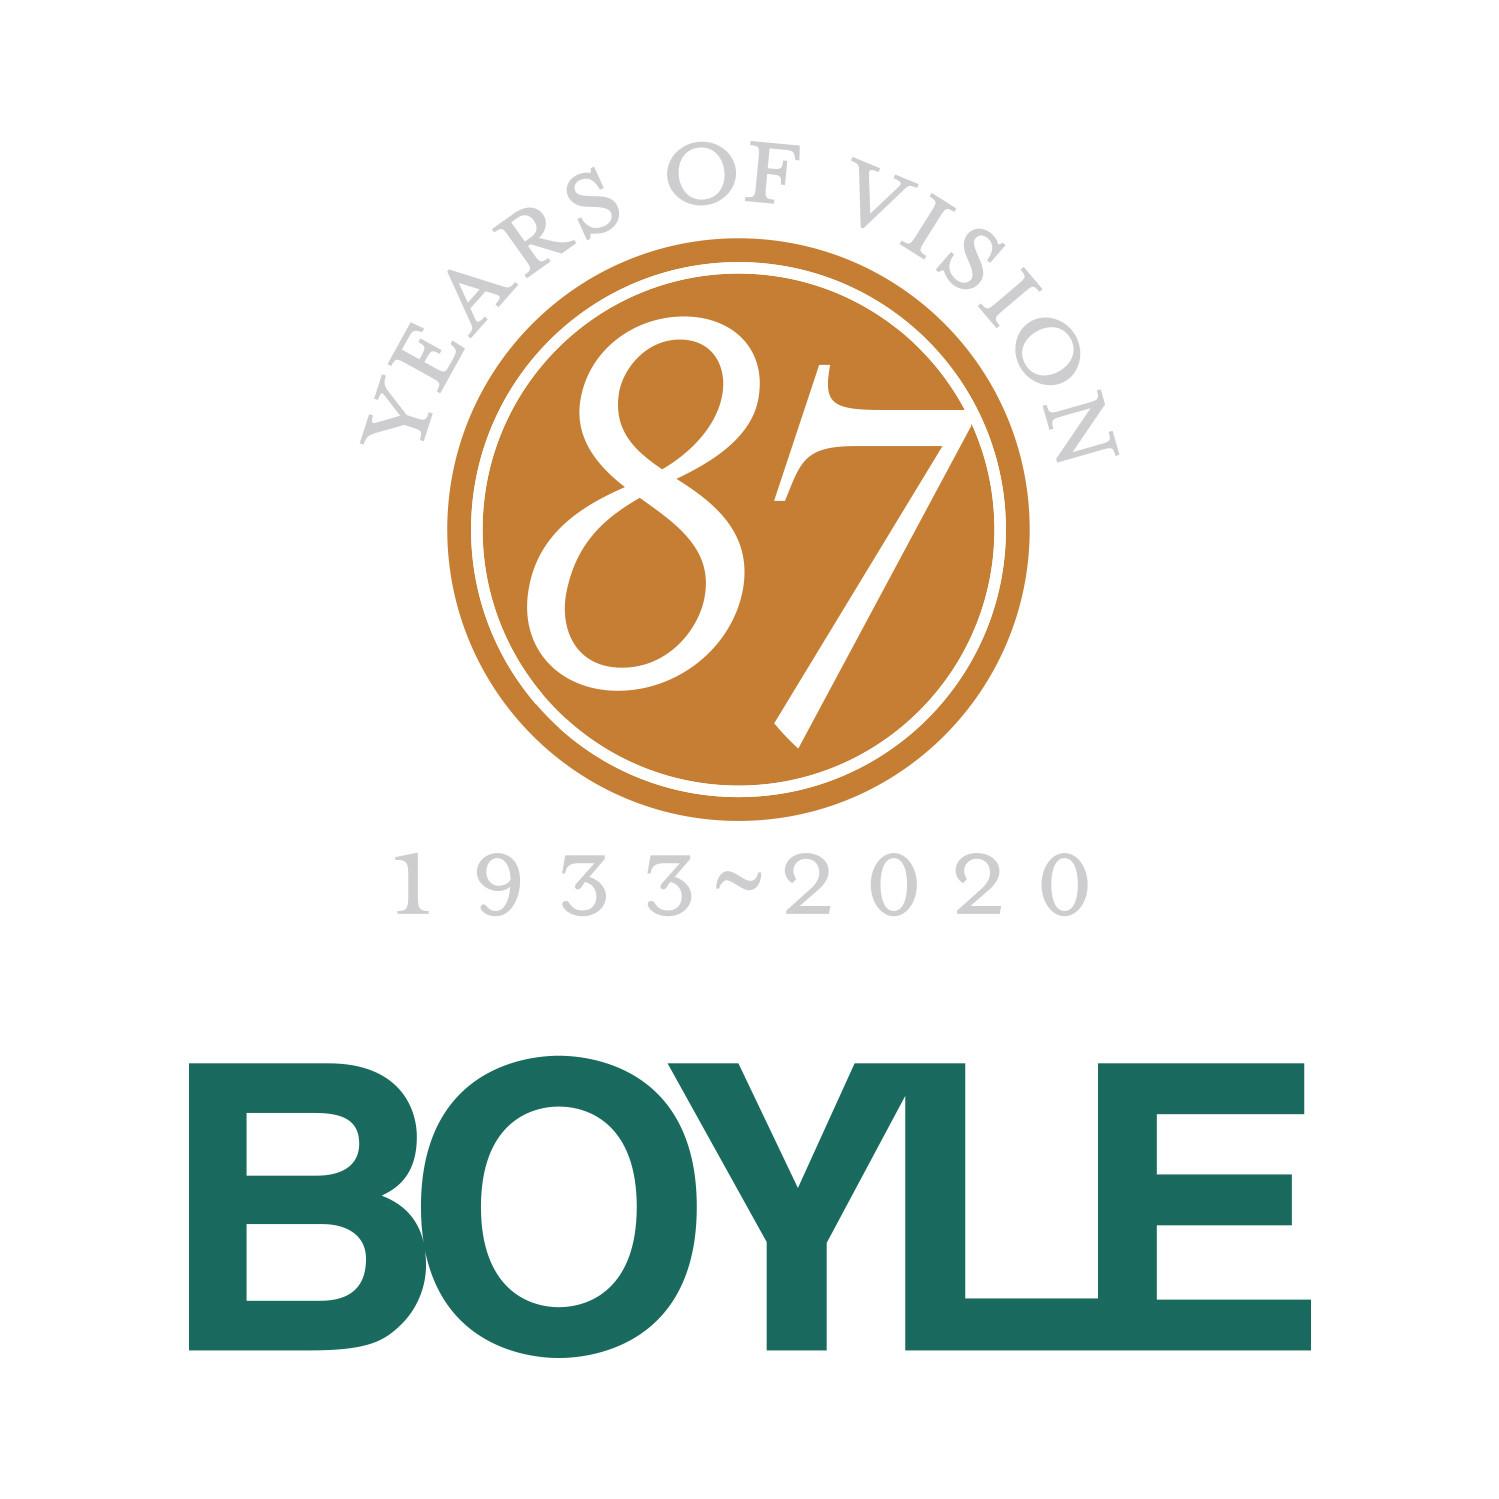 Boyle Investment Company